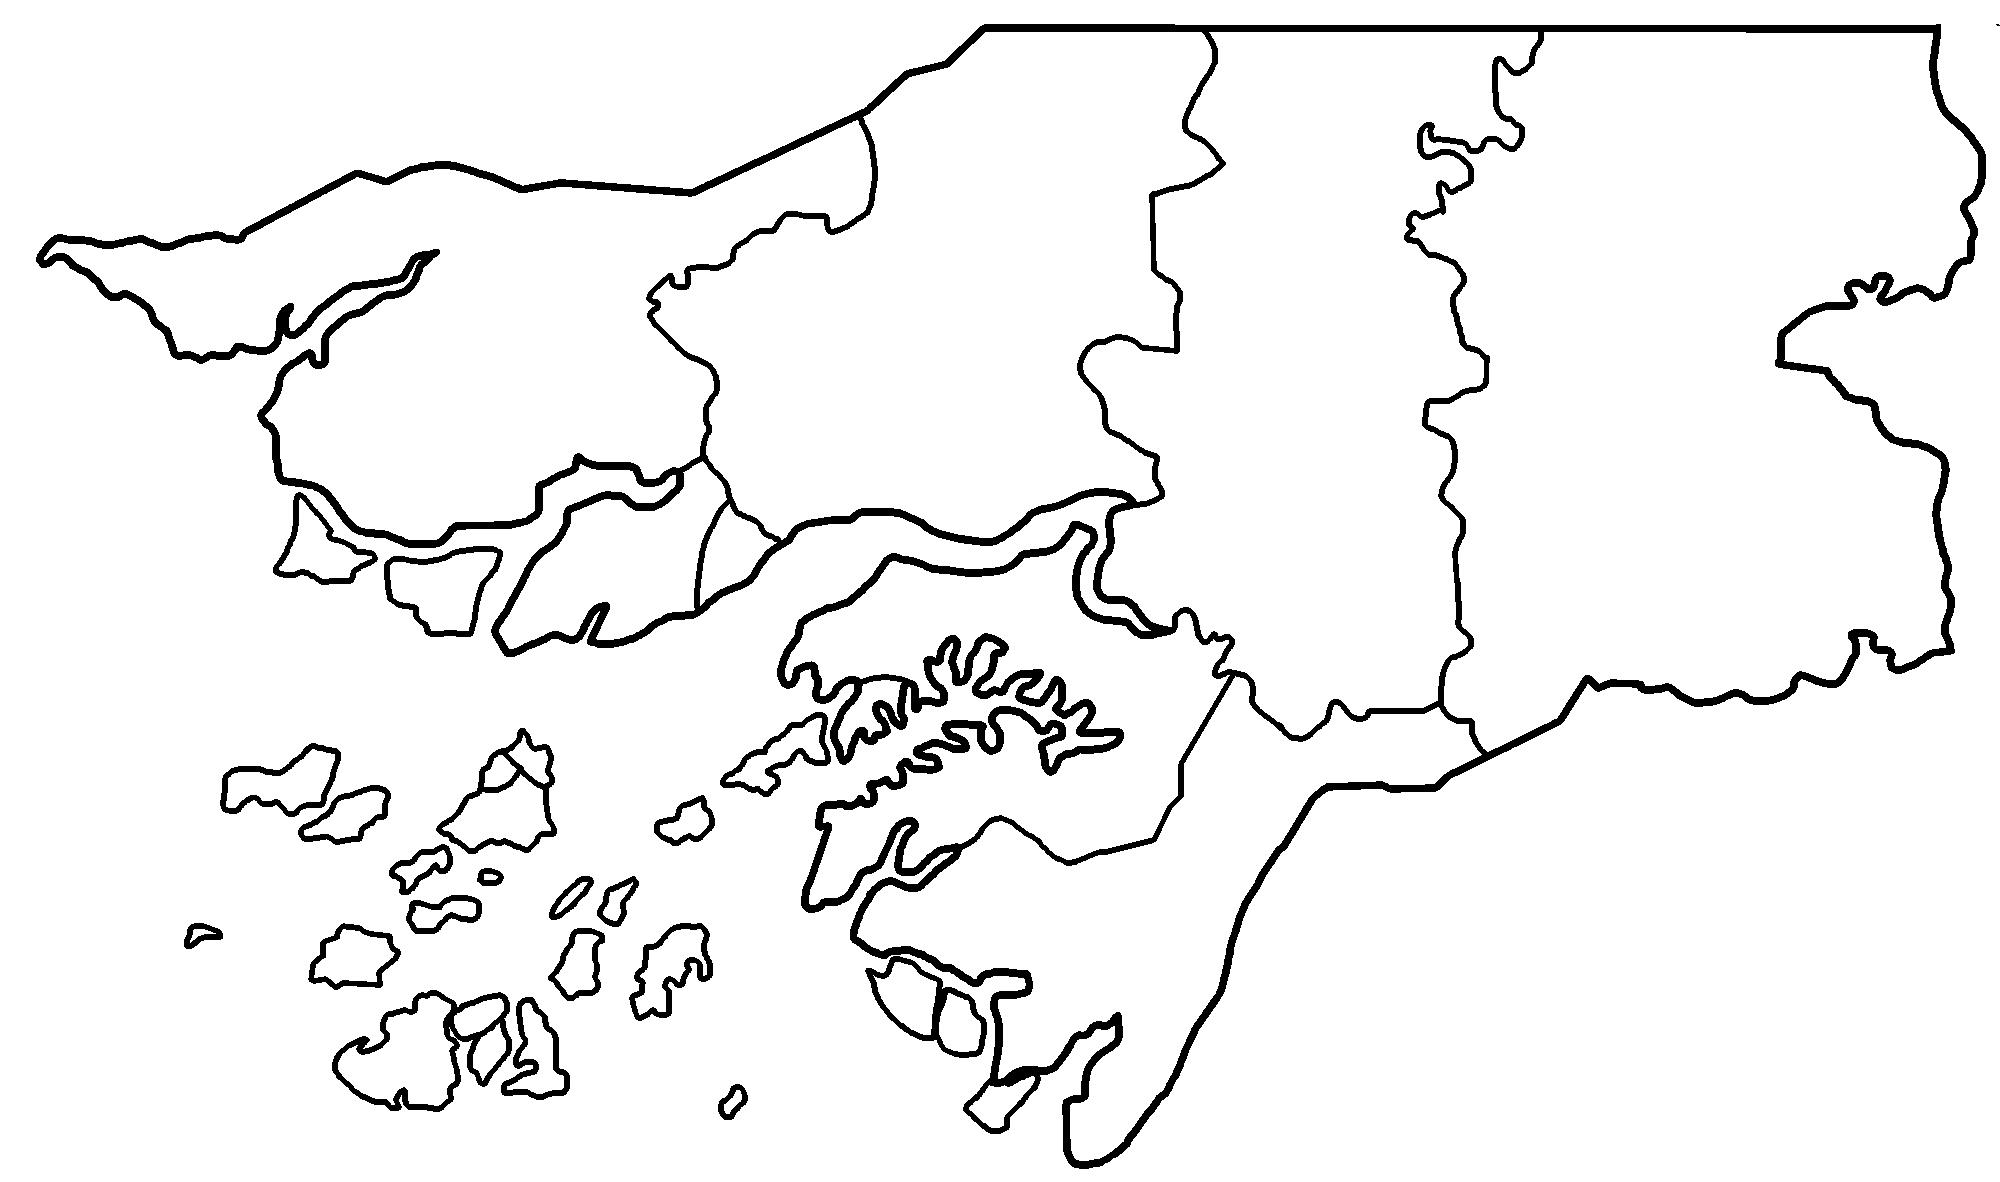 FileGuinea Bissau Regions Blankpng Wikimedia Commons - Guinea bissau map